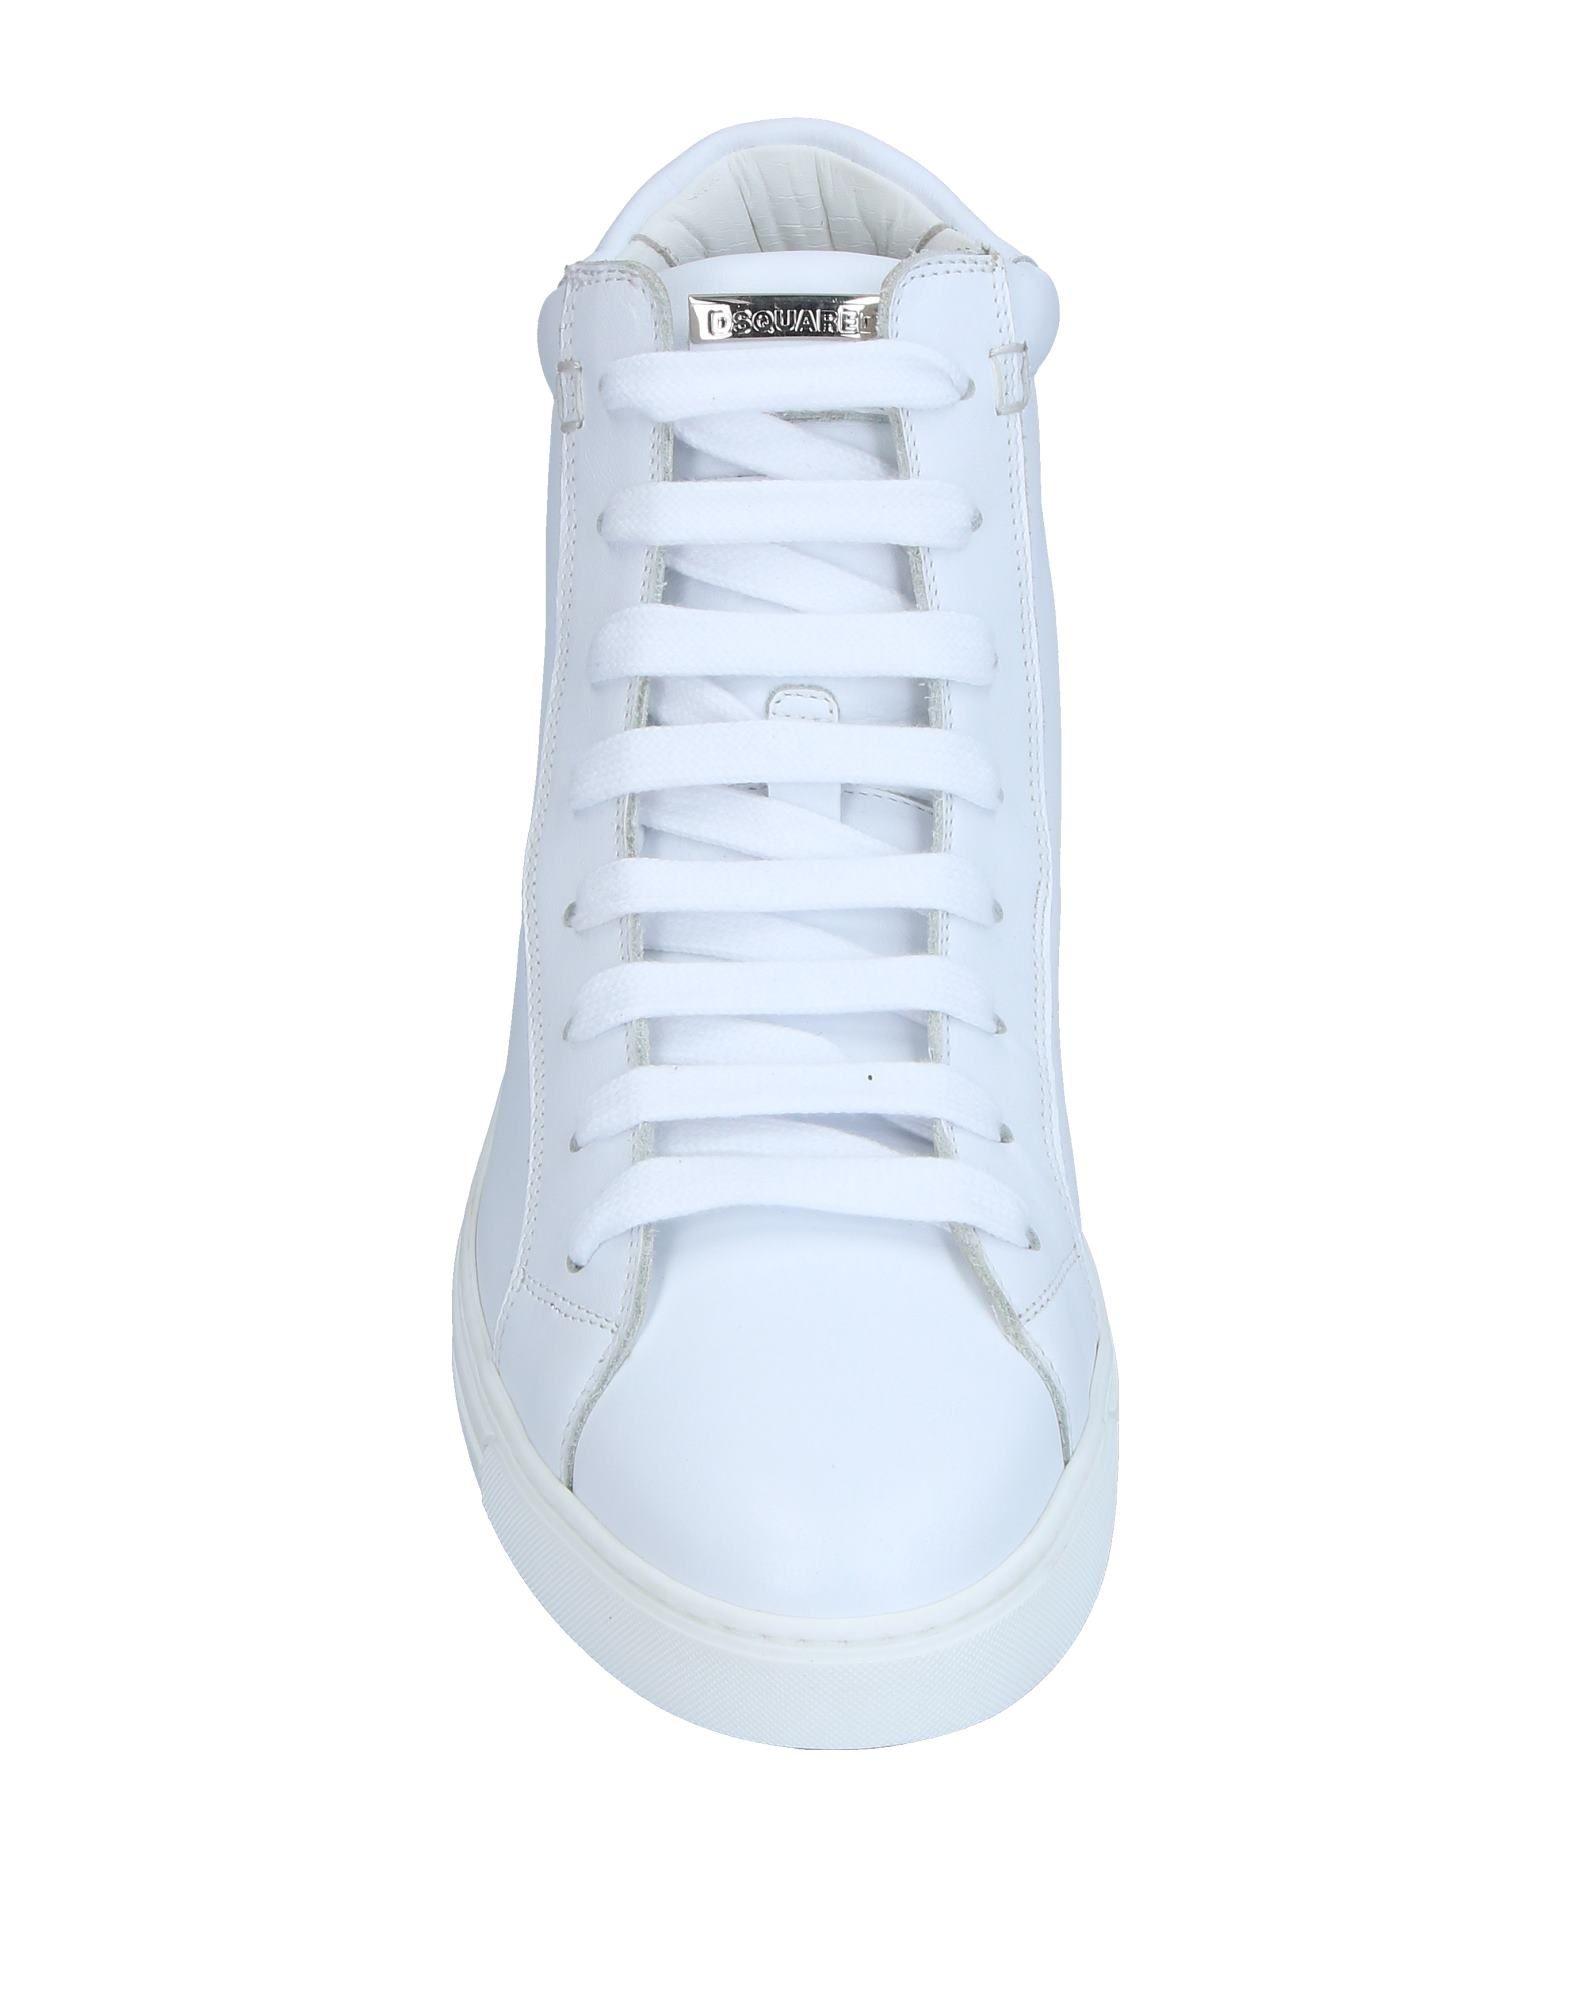 Dsquared2 Sneakers Qualität Herren  11297796EM Gute Qualität Sneakers beliebte Schuhe 832a07